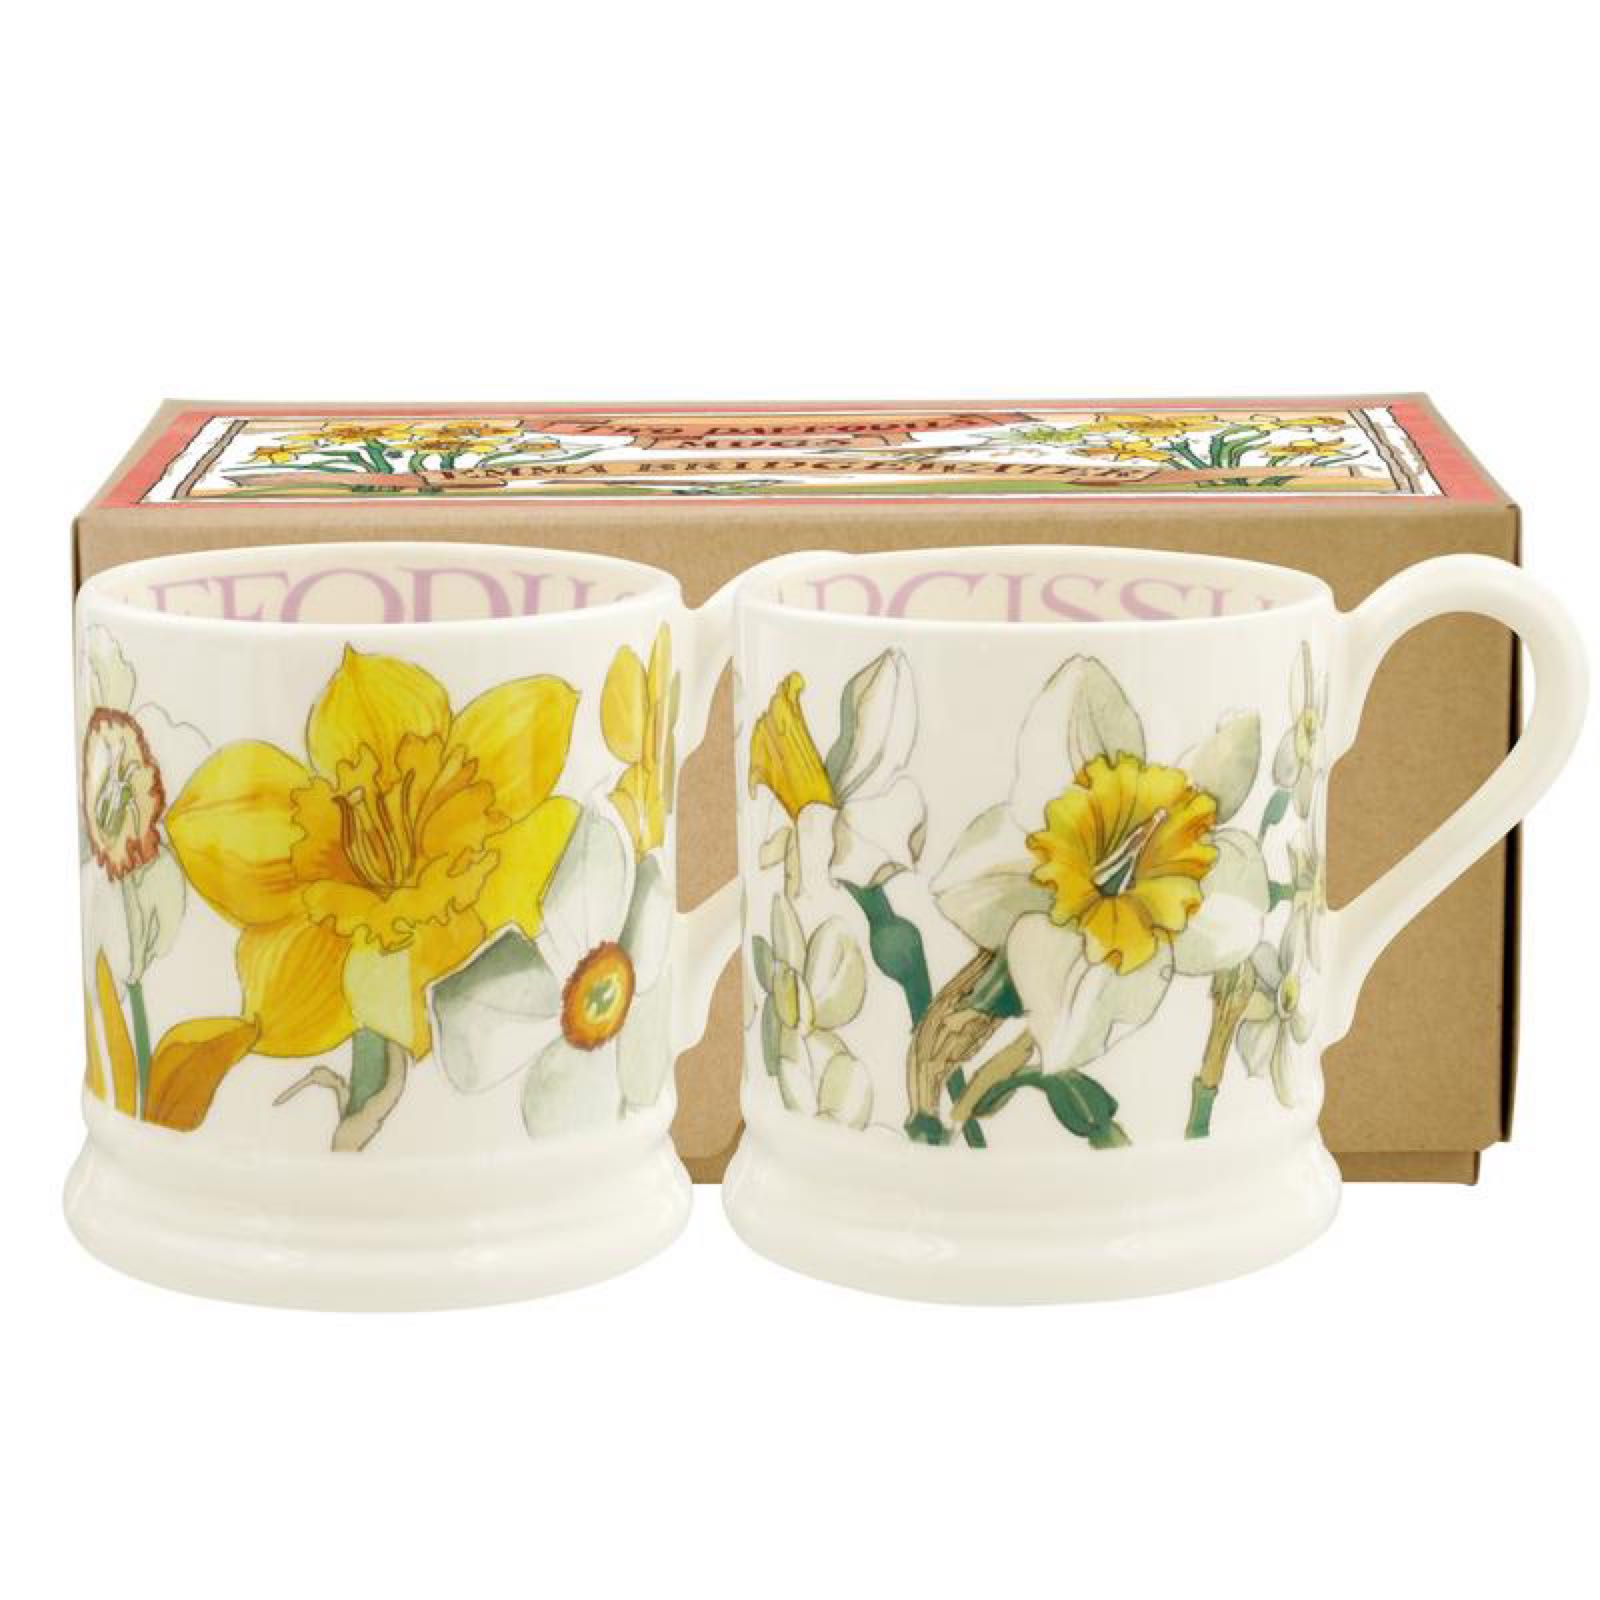 Emma Bridgewater Flowers Daffodils & Narcissus Set of 2 1/2 Pint Mugs Boxed